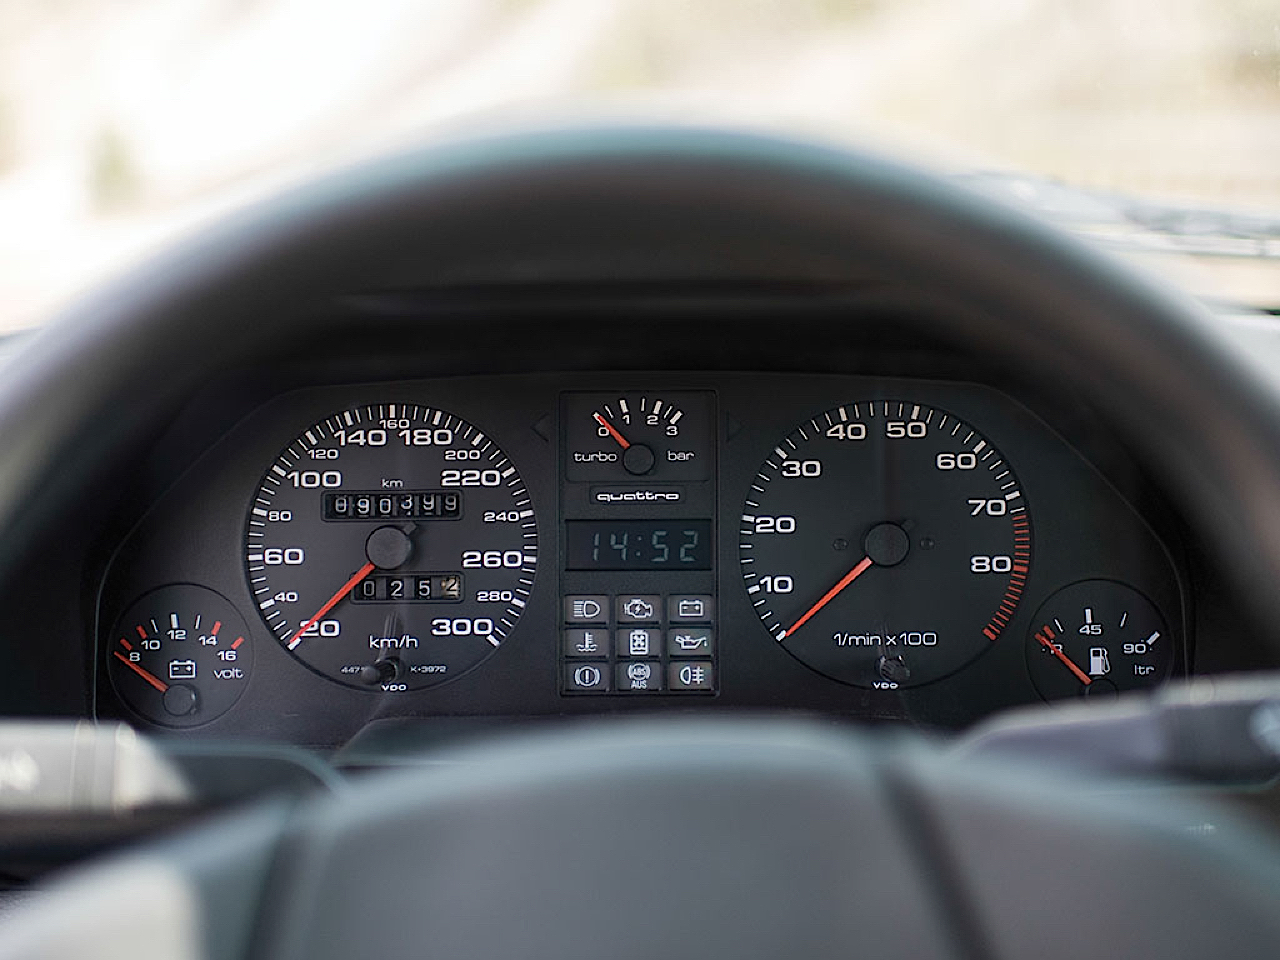 Audi Quattro Sport - Châssis court, turbo et muscu ! 24